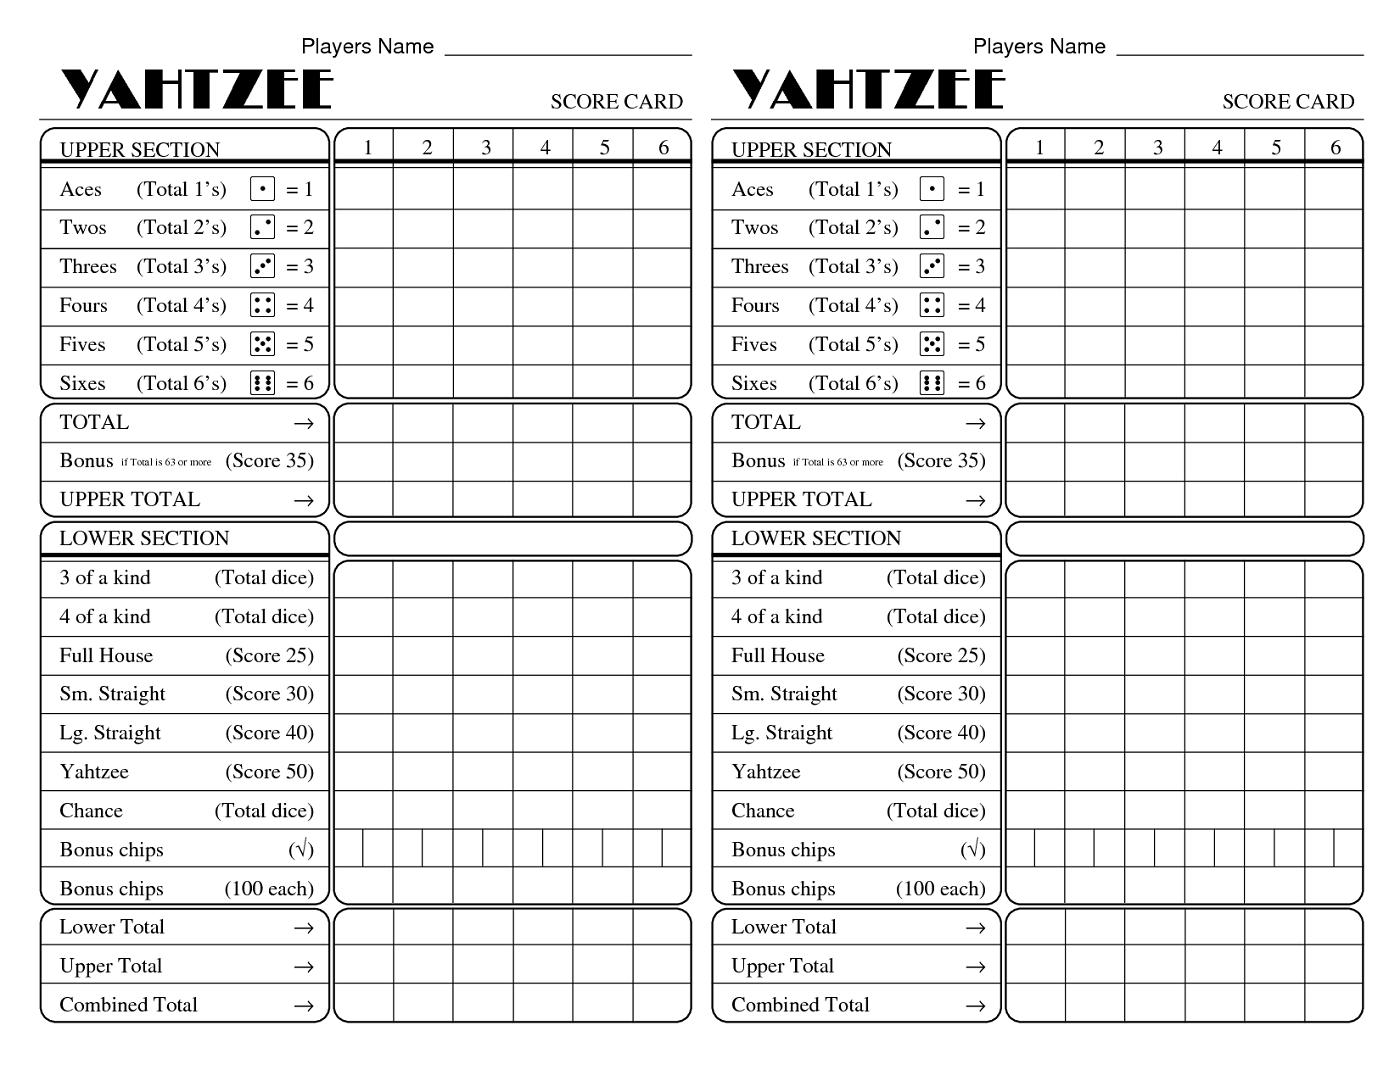 graphic regarding Printable Yahtzee Score Sheets 4 Per Page identified as Yahtzee Ranking Sheets Printable Recreation Shelter